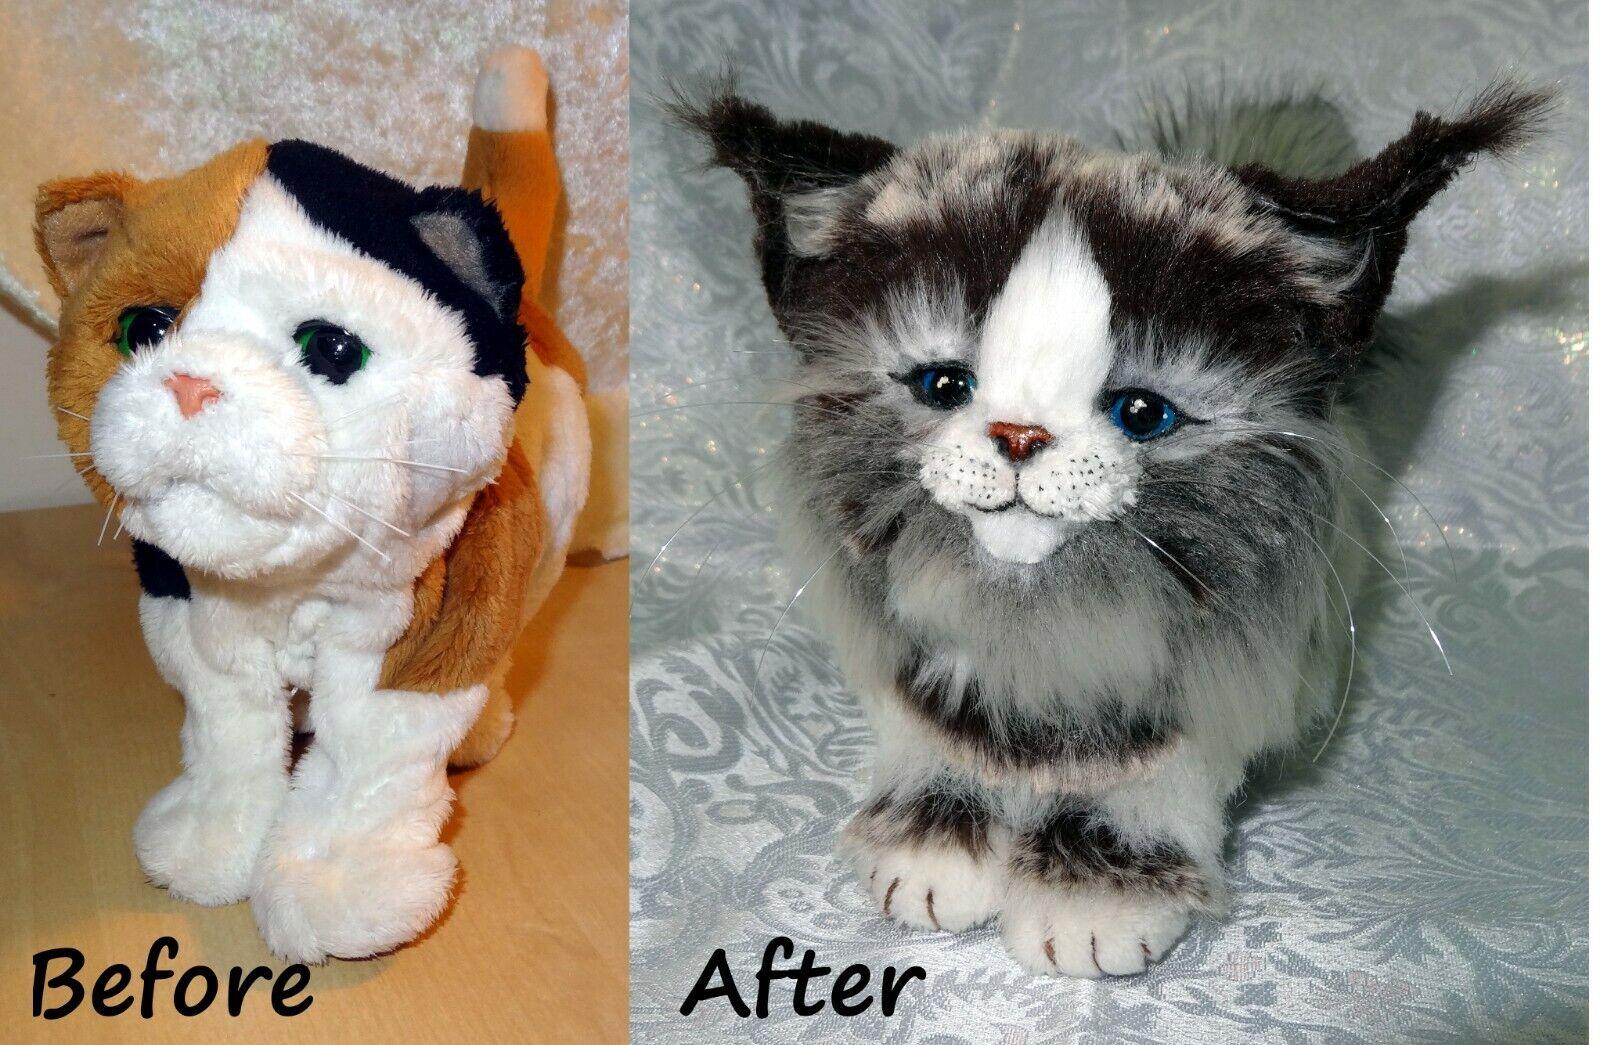 Furreal LYNX Ragdoll Calico Kitten Cat Hasbro robot art re-furred OOAK by Olia